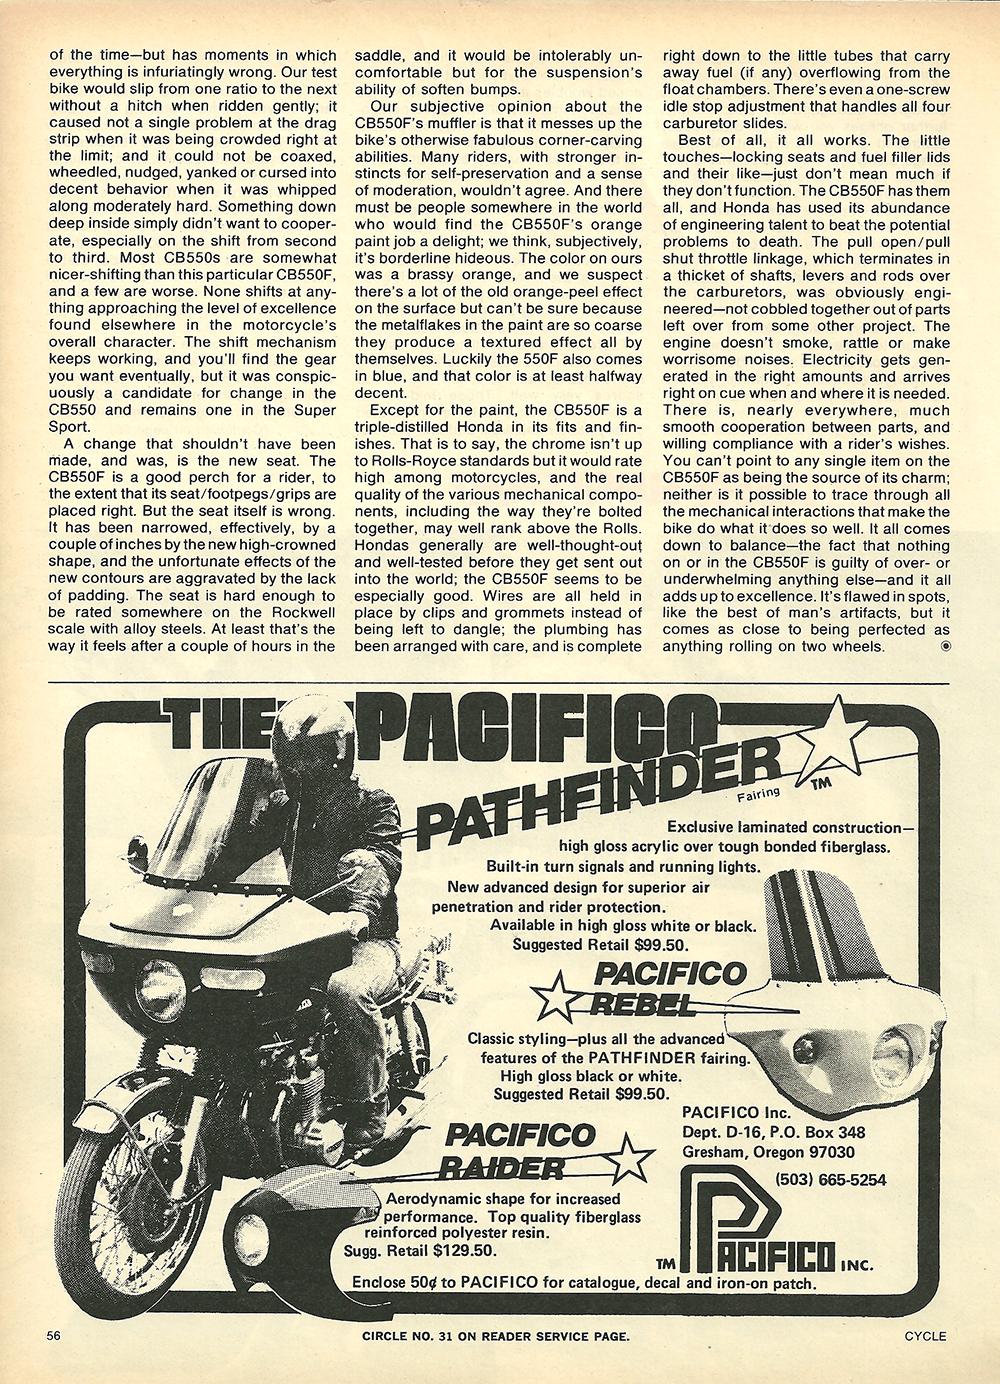 1975 Honda CB550F SS road test 6.jpg